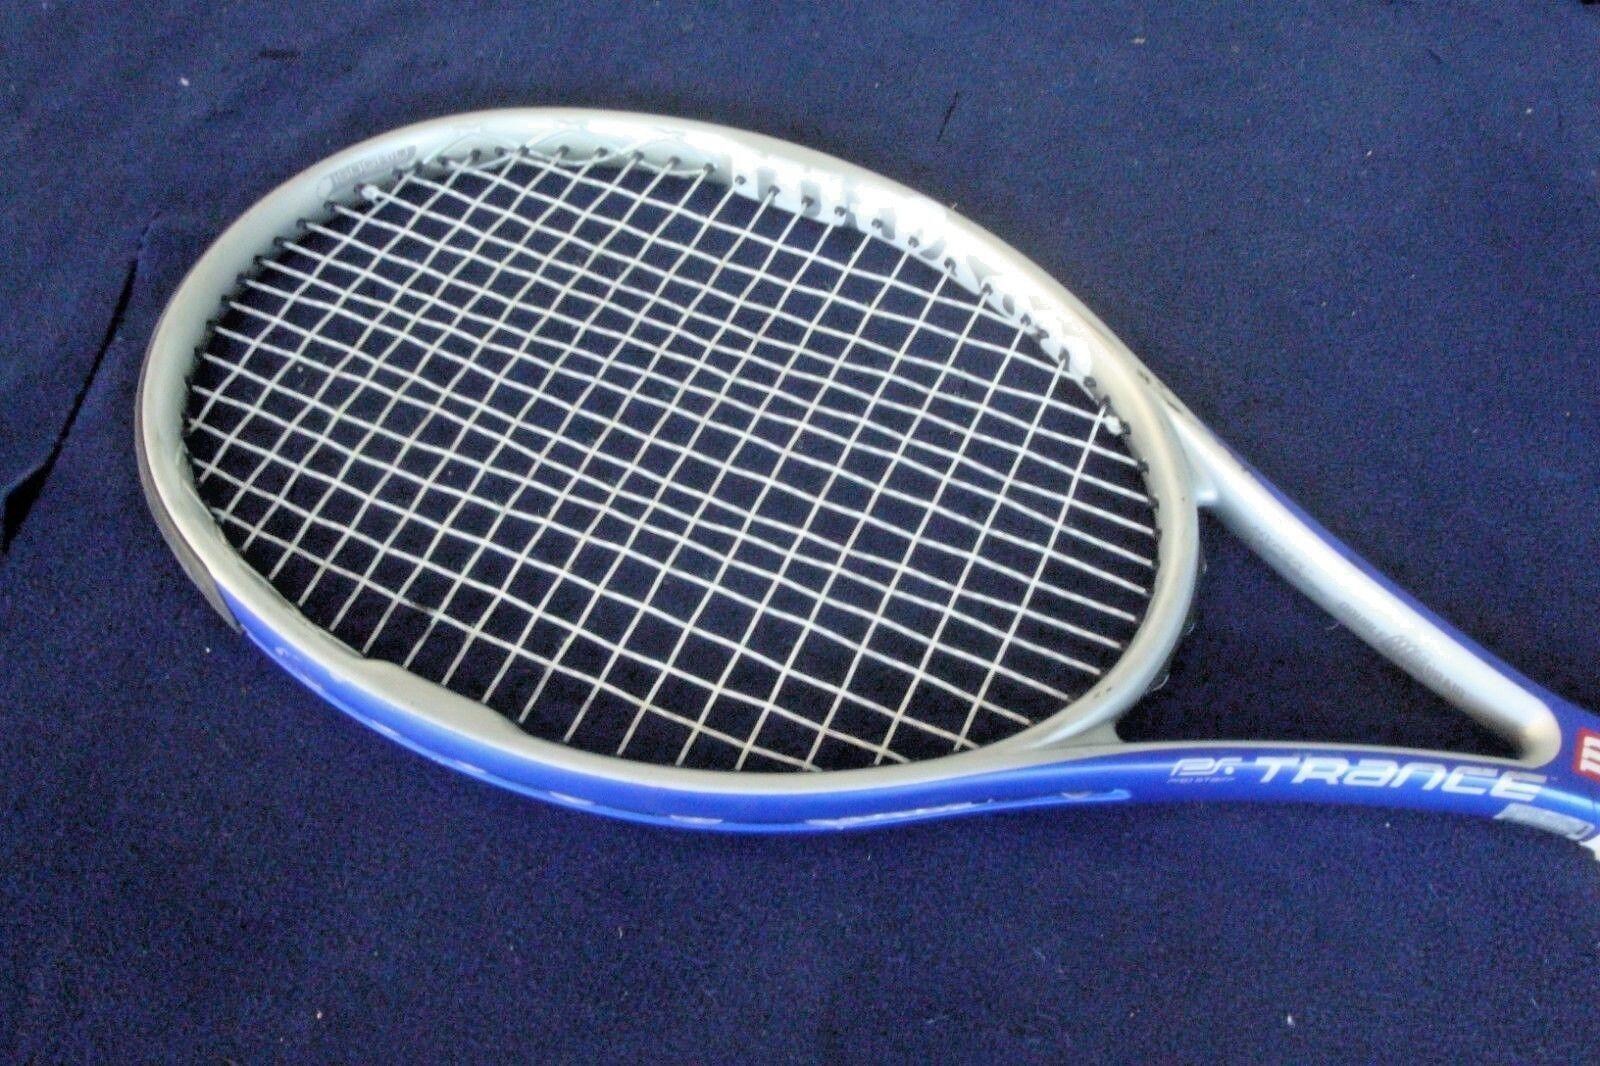 Wilson Pro Staff Trance MidPlus 95  Tennis Racquet 4 3 8   EXCELLENT